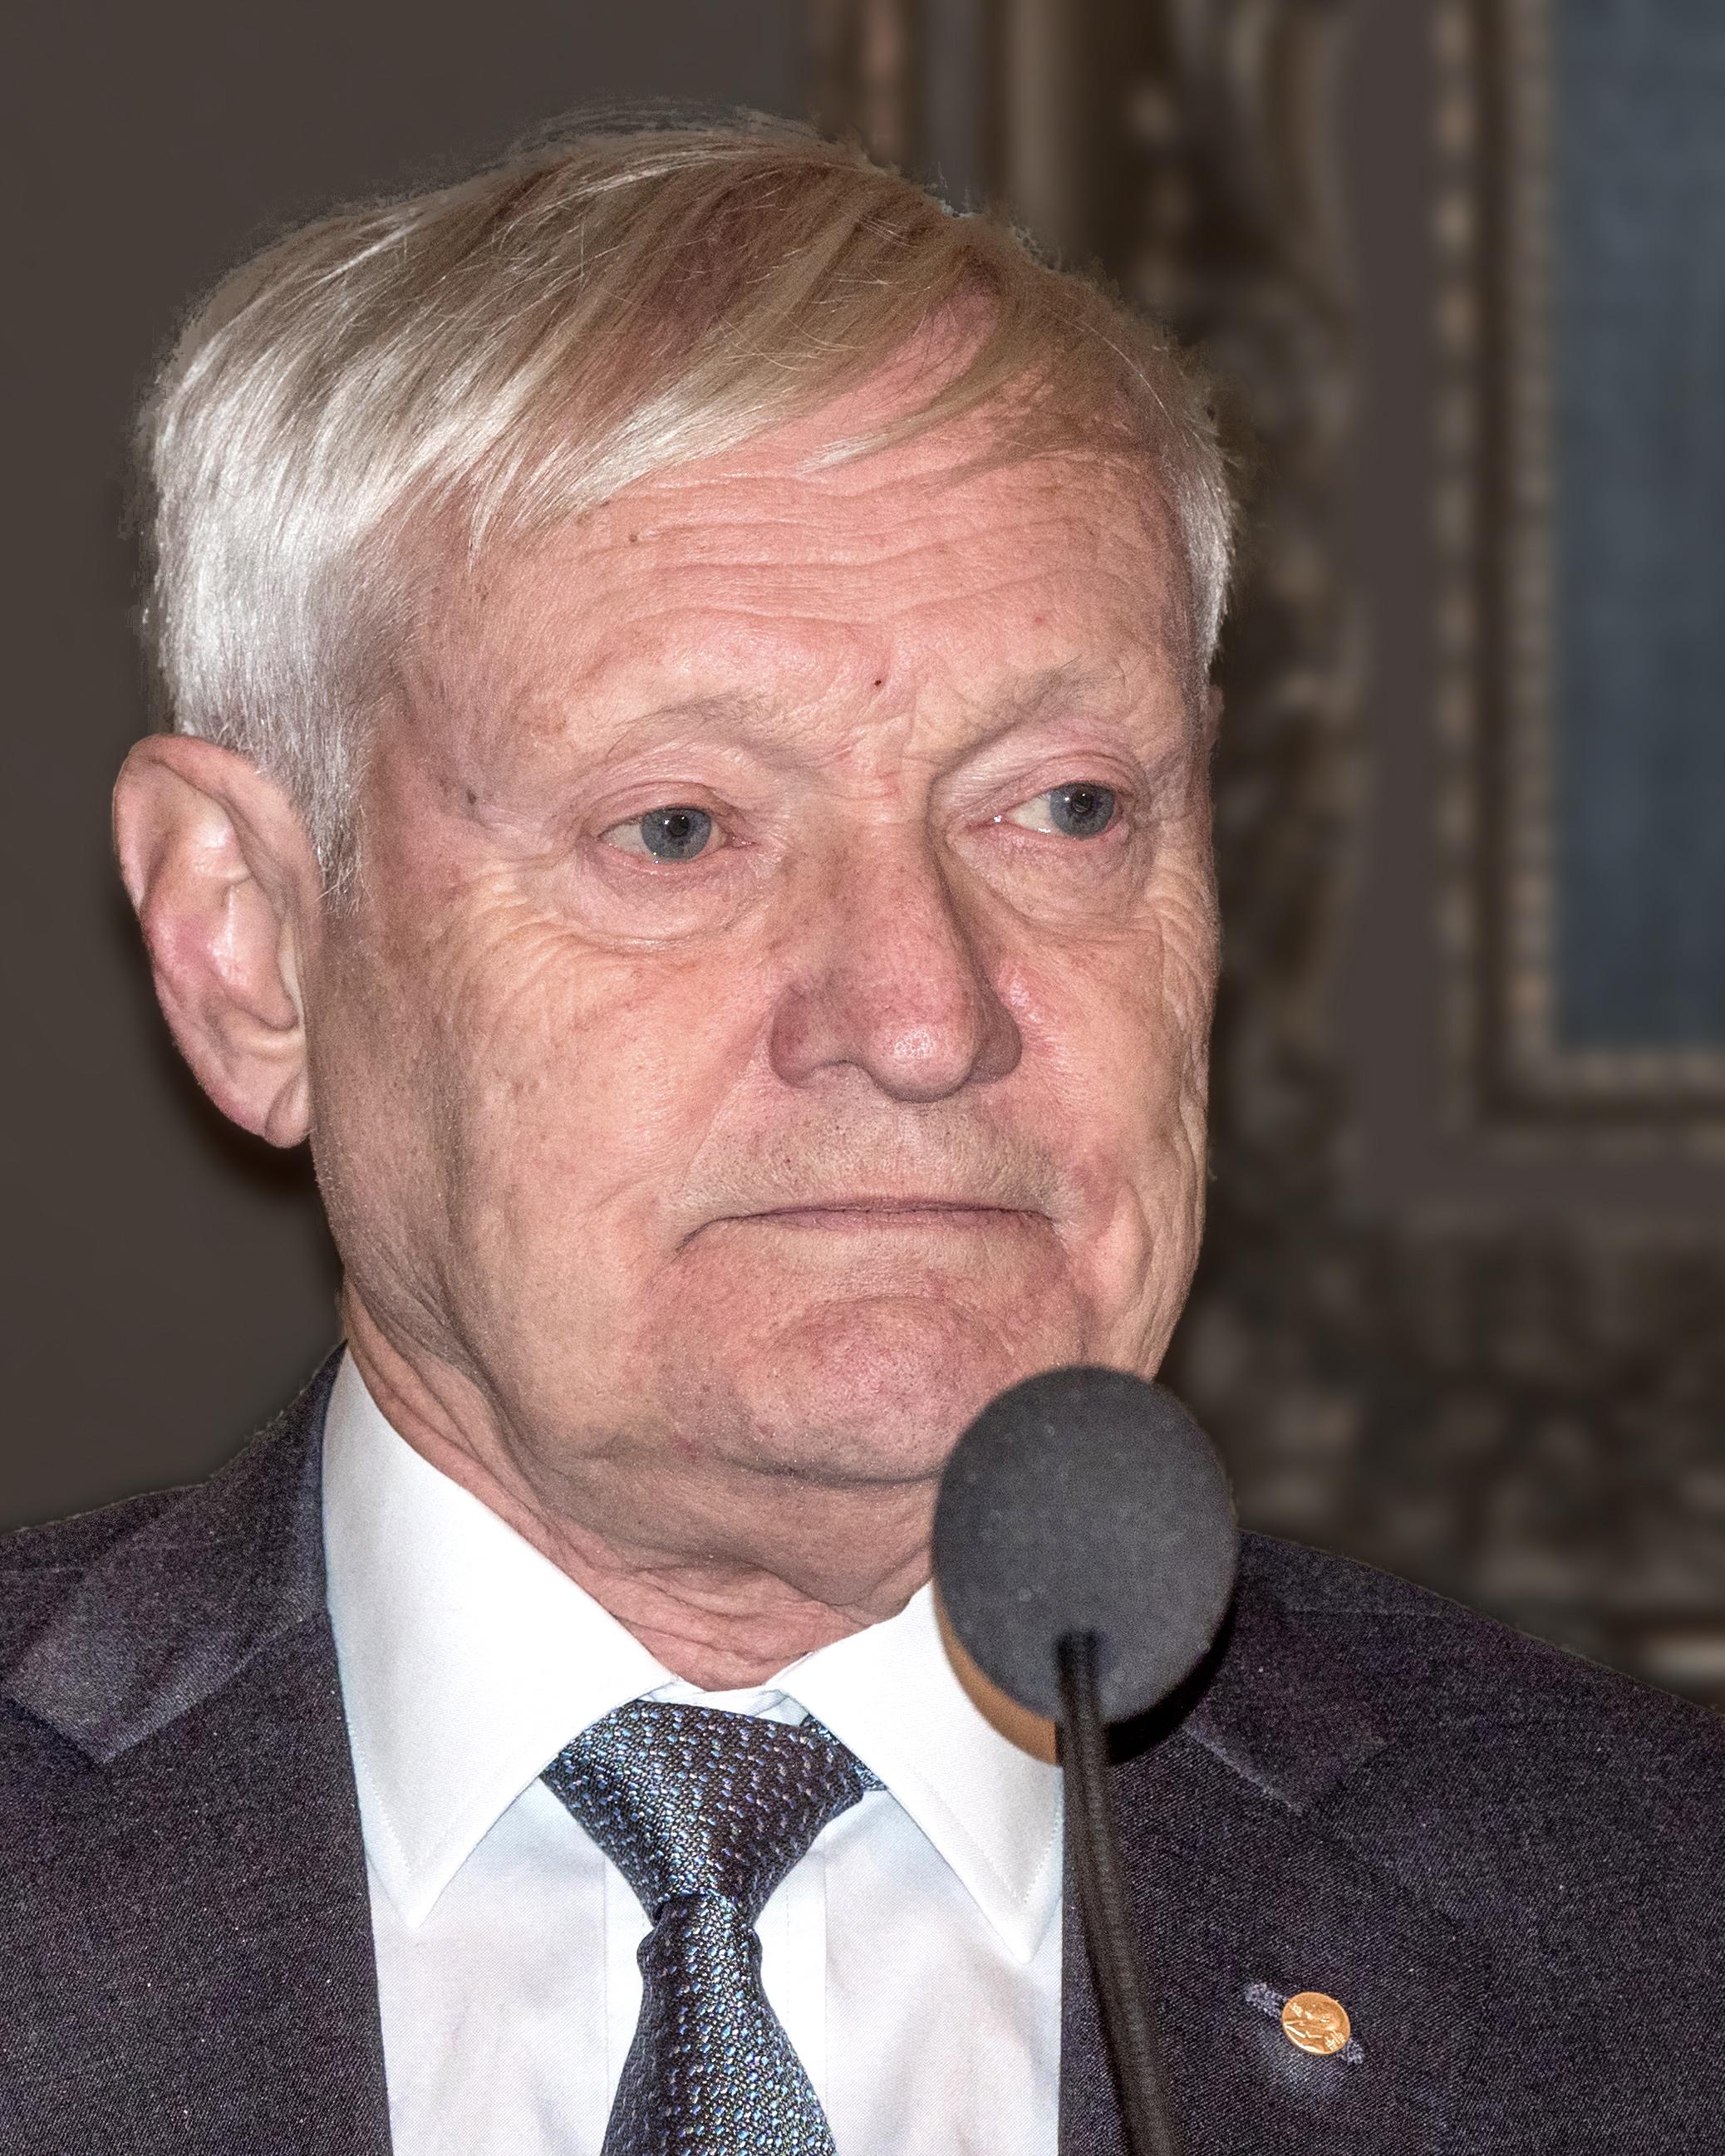 image of Joachim Frank